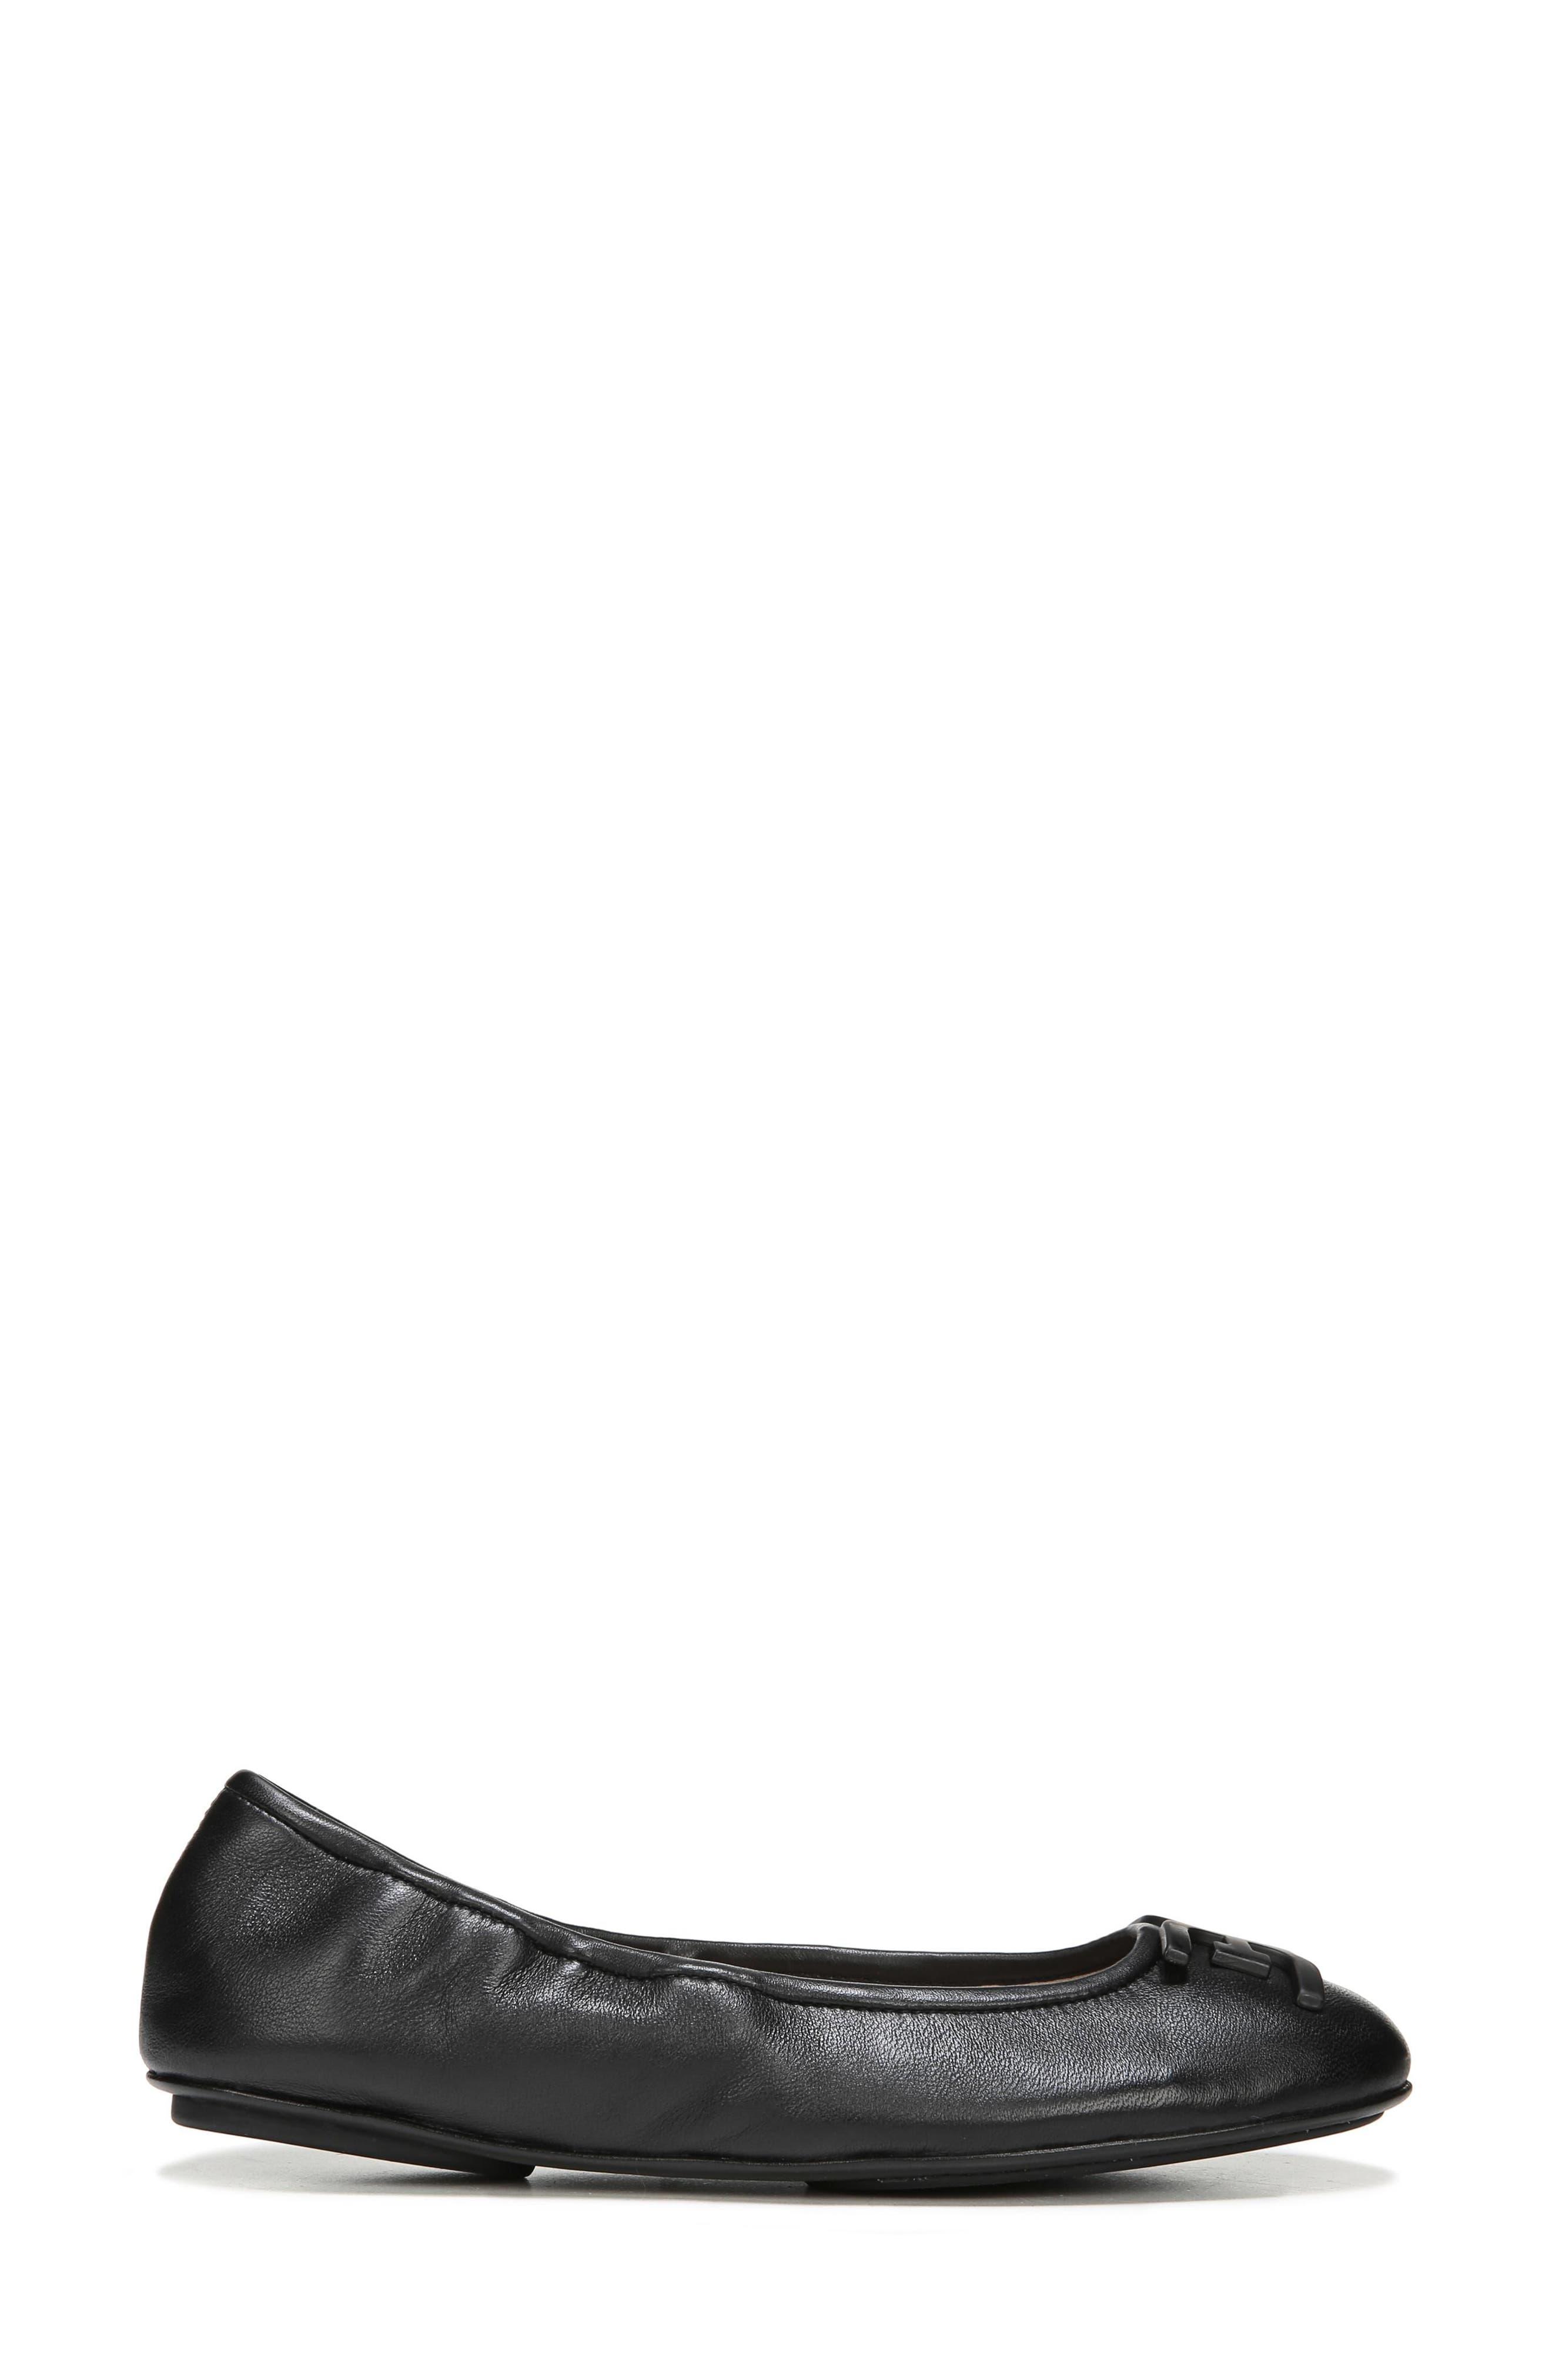 Florence Ballet Flat,                             Alternate thumbnail 3, color,                             Black Leather